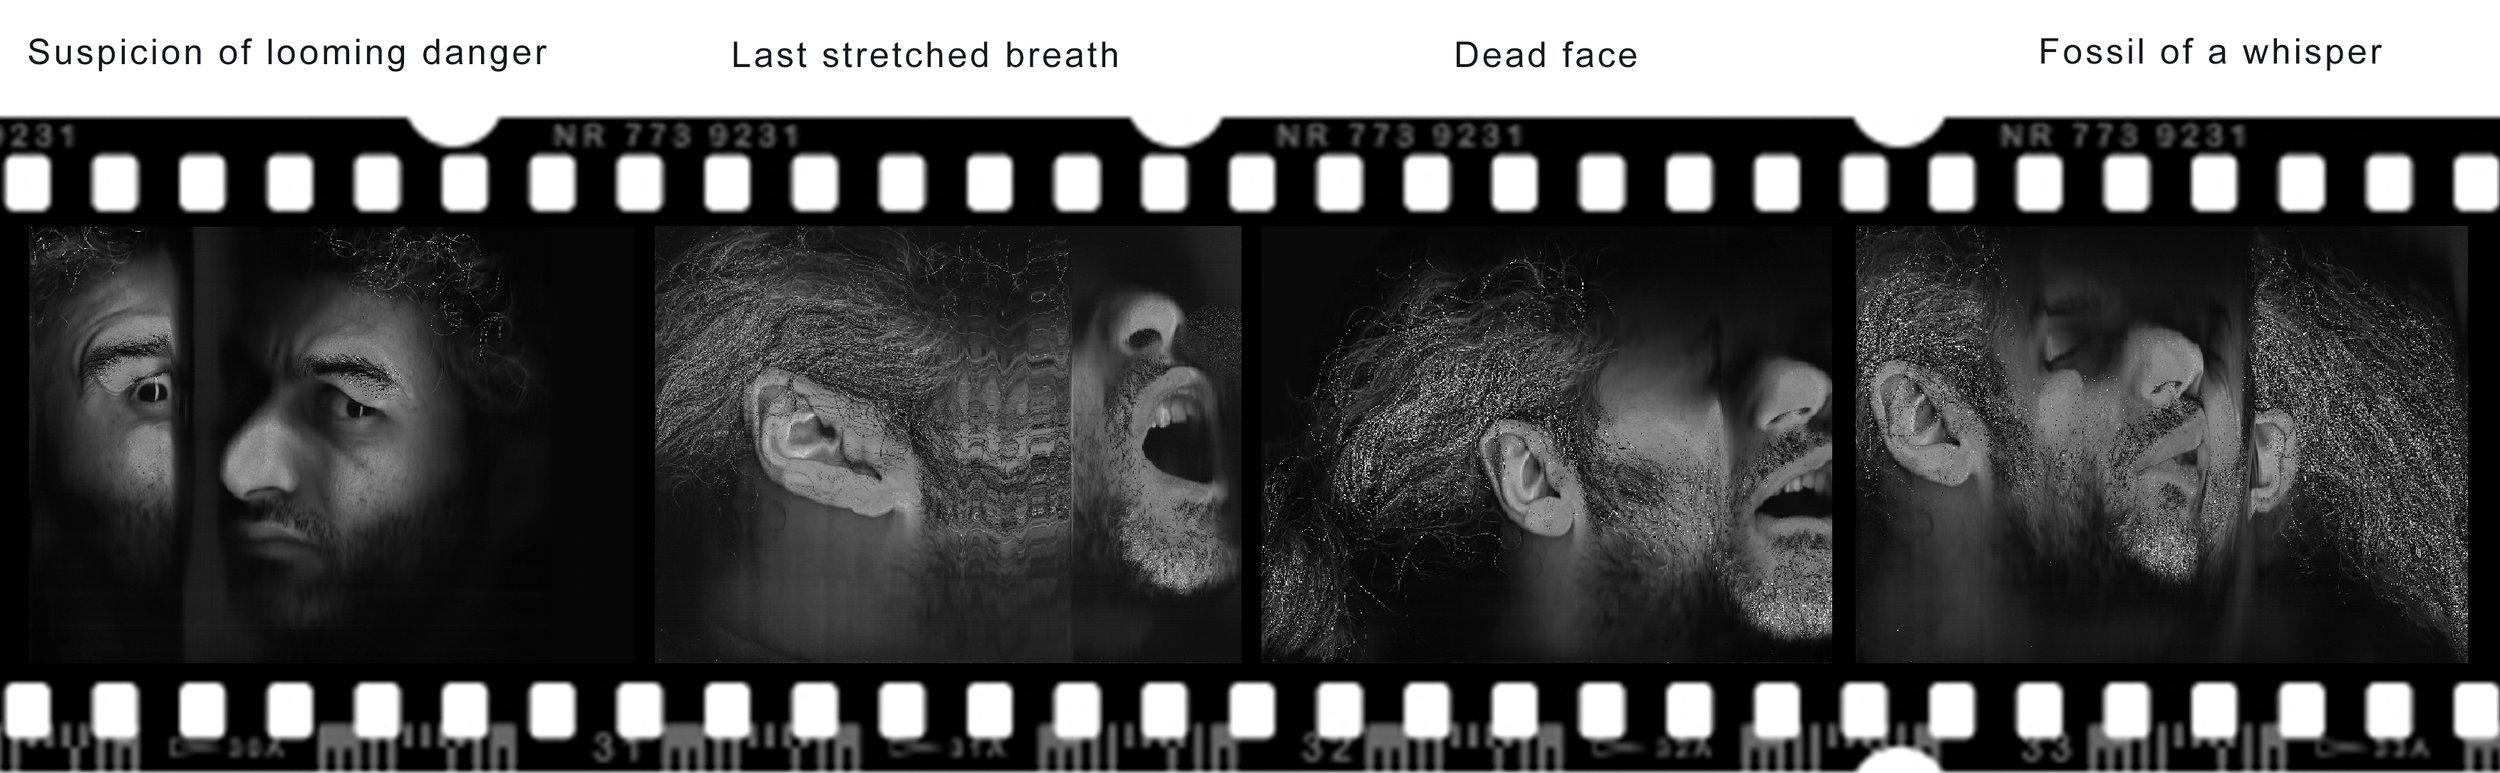 Enkidu's death narrative.jpg